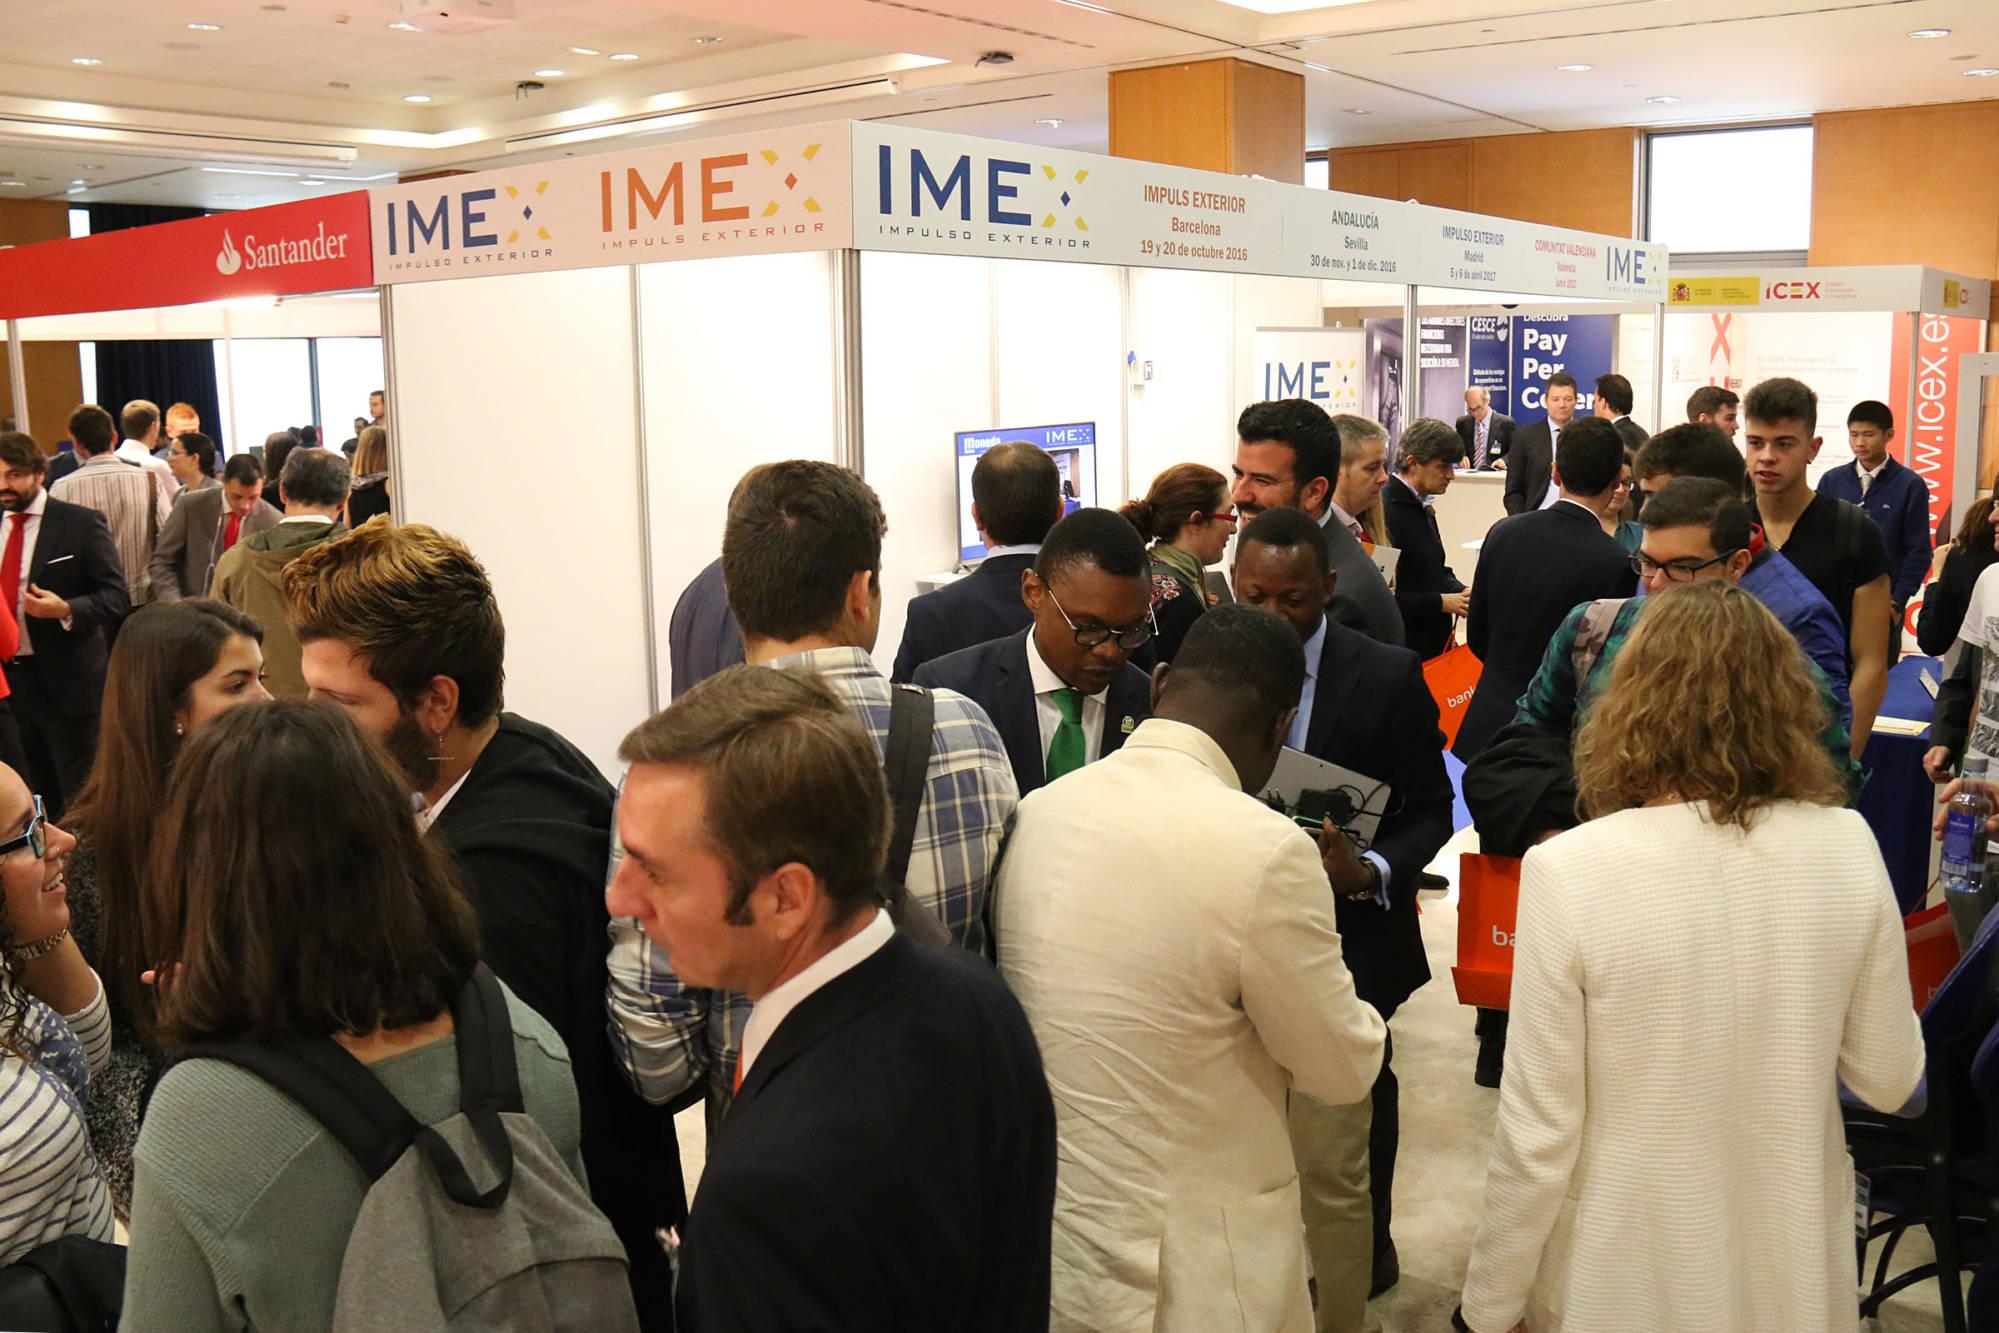 IMEX-Barcelona 2016